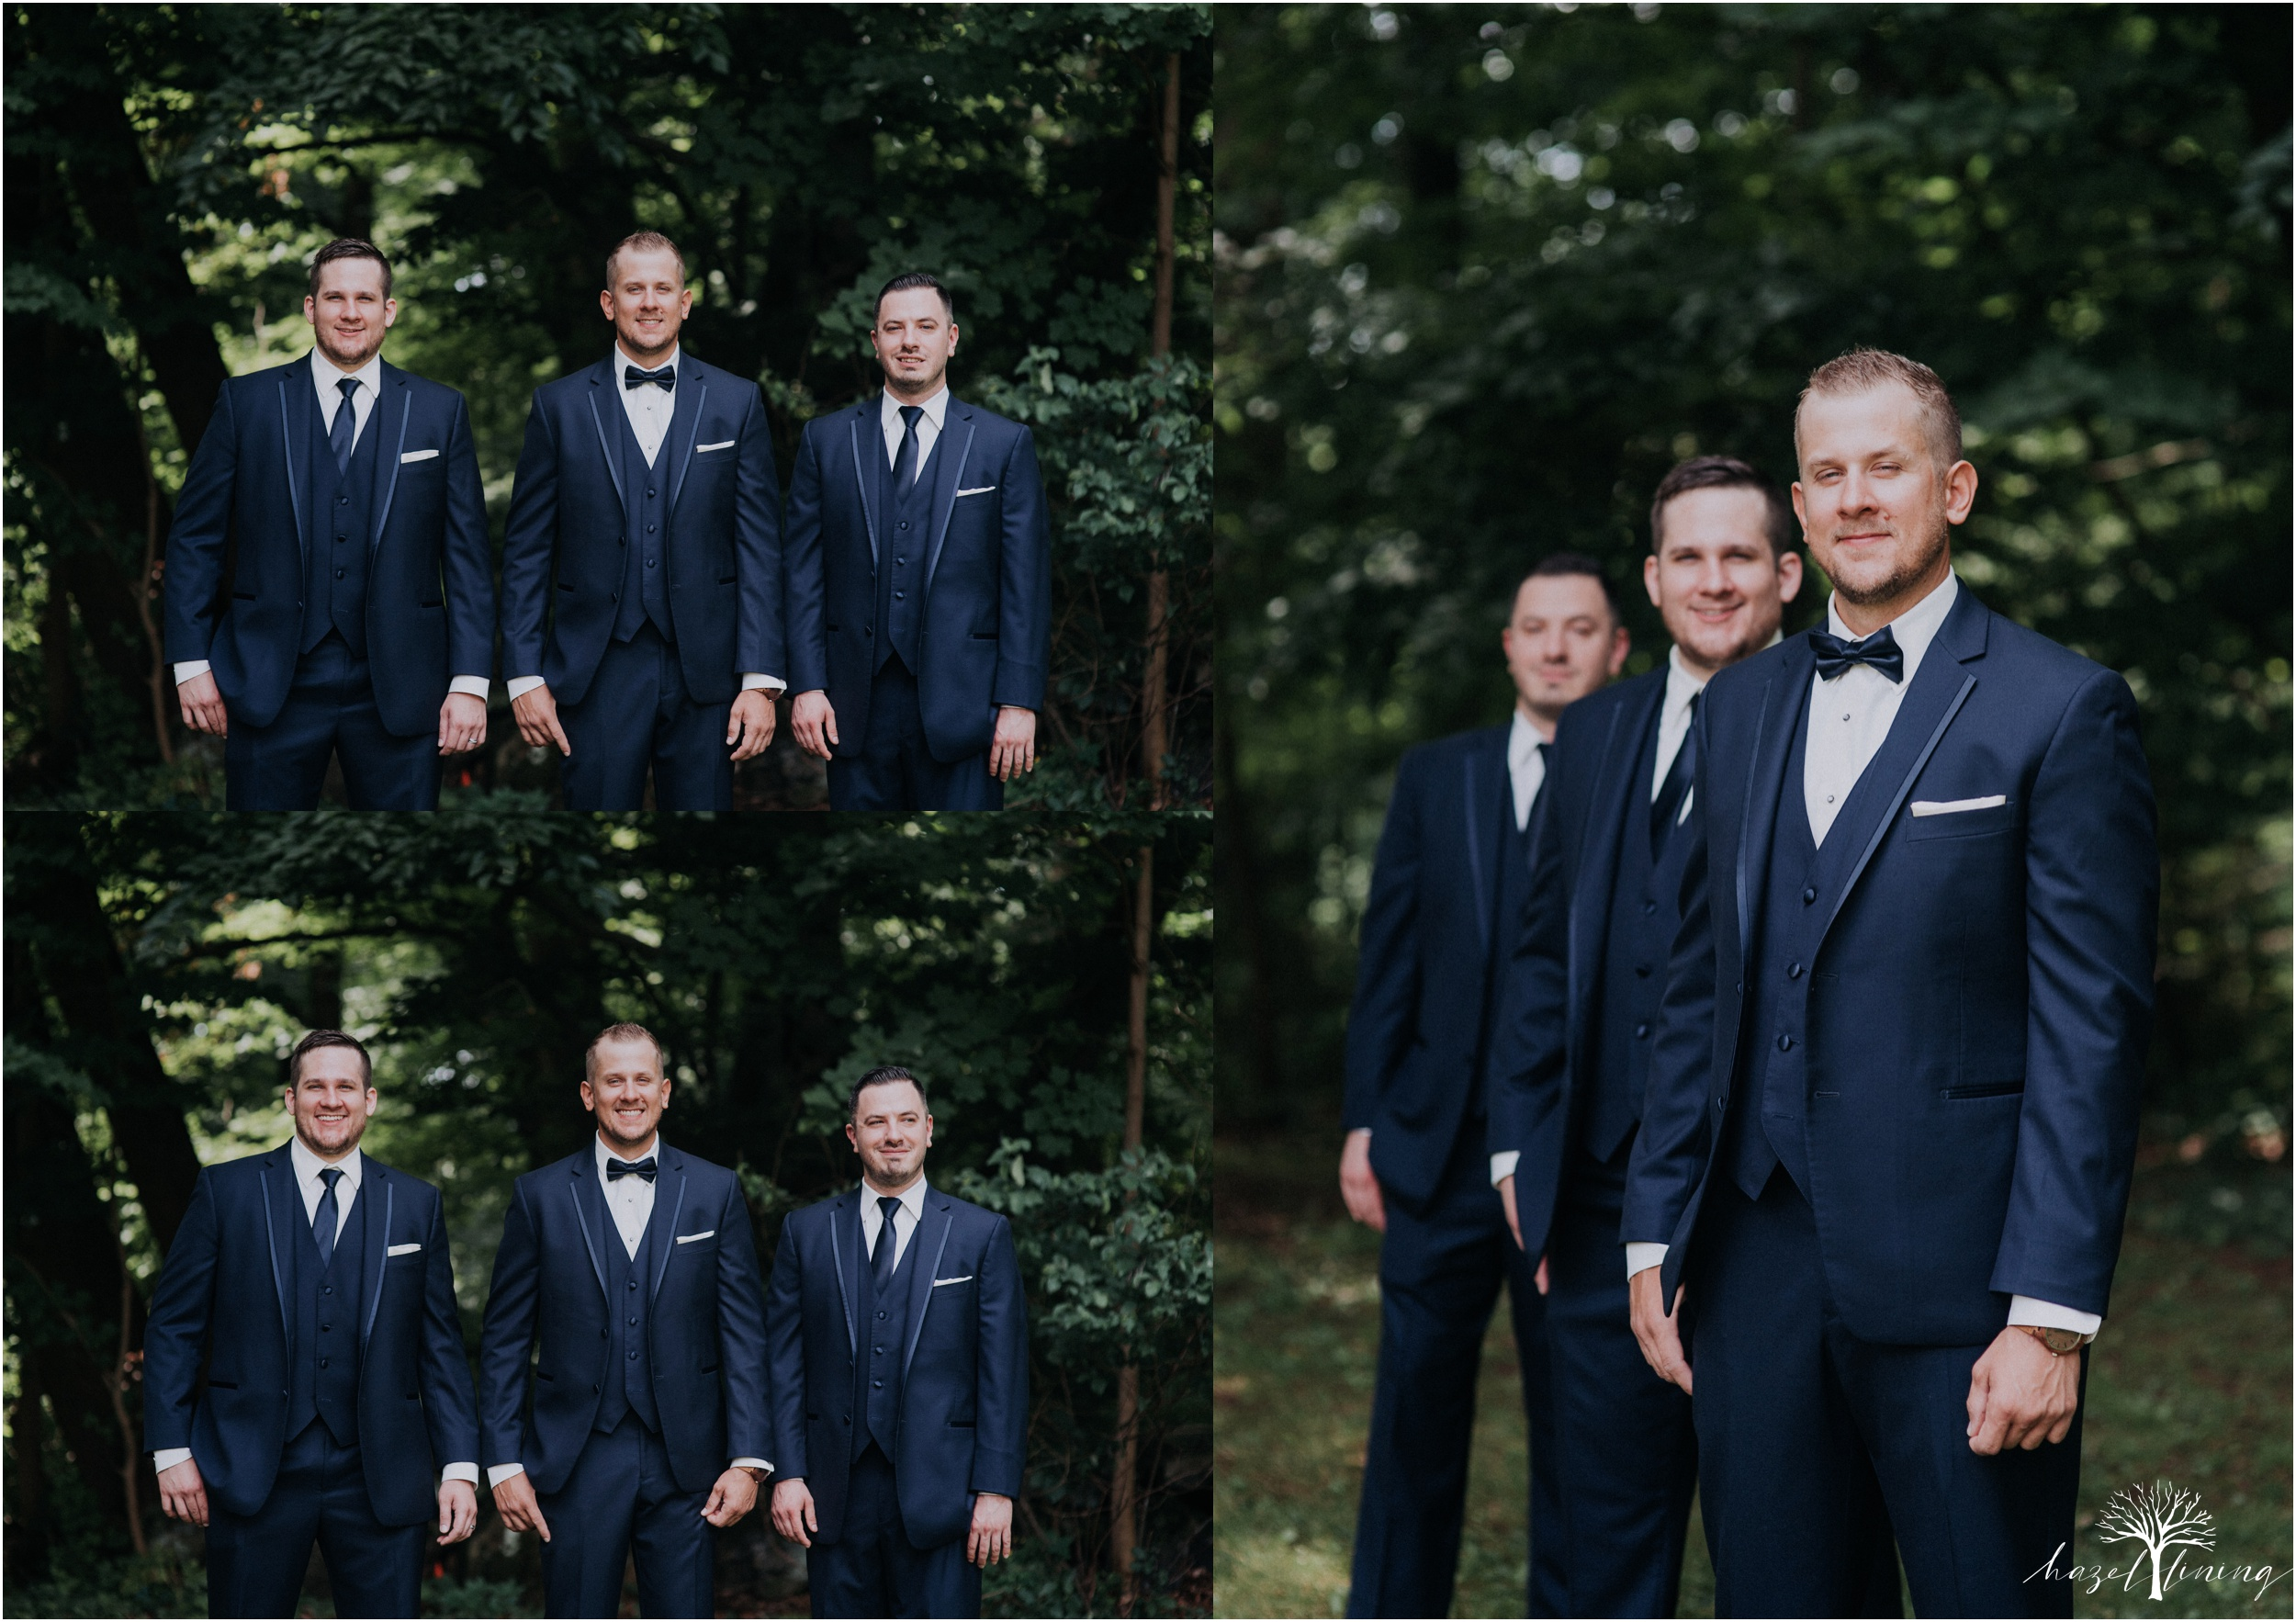 alyssa-james-stiteler-wedding-loft-and-sweet-water-cc-pennsburg-pennsylvania-hazel-lining-travel-wedding-elopement-photography_0010.jpg